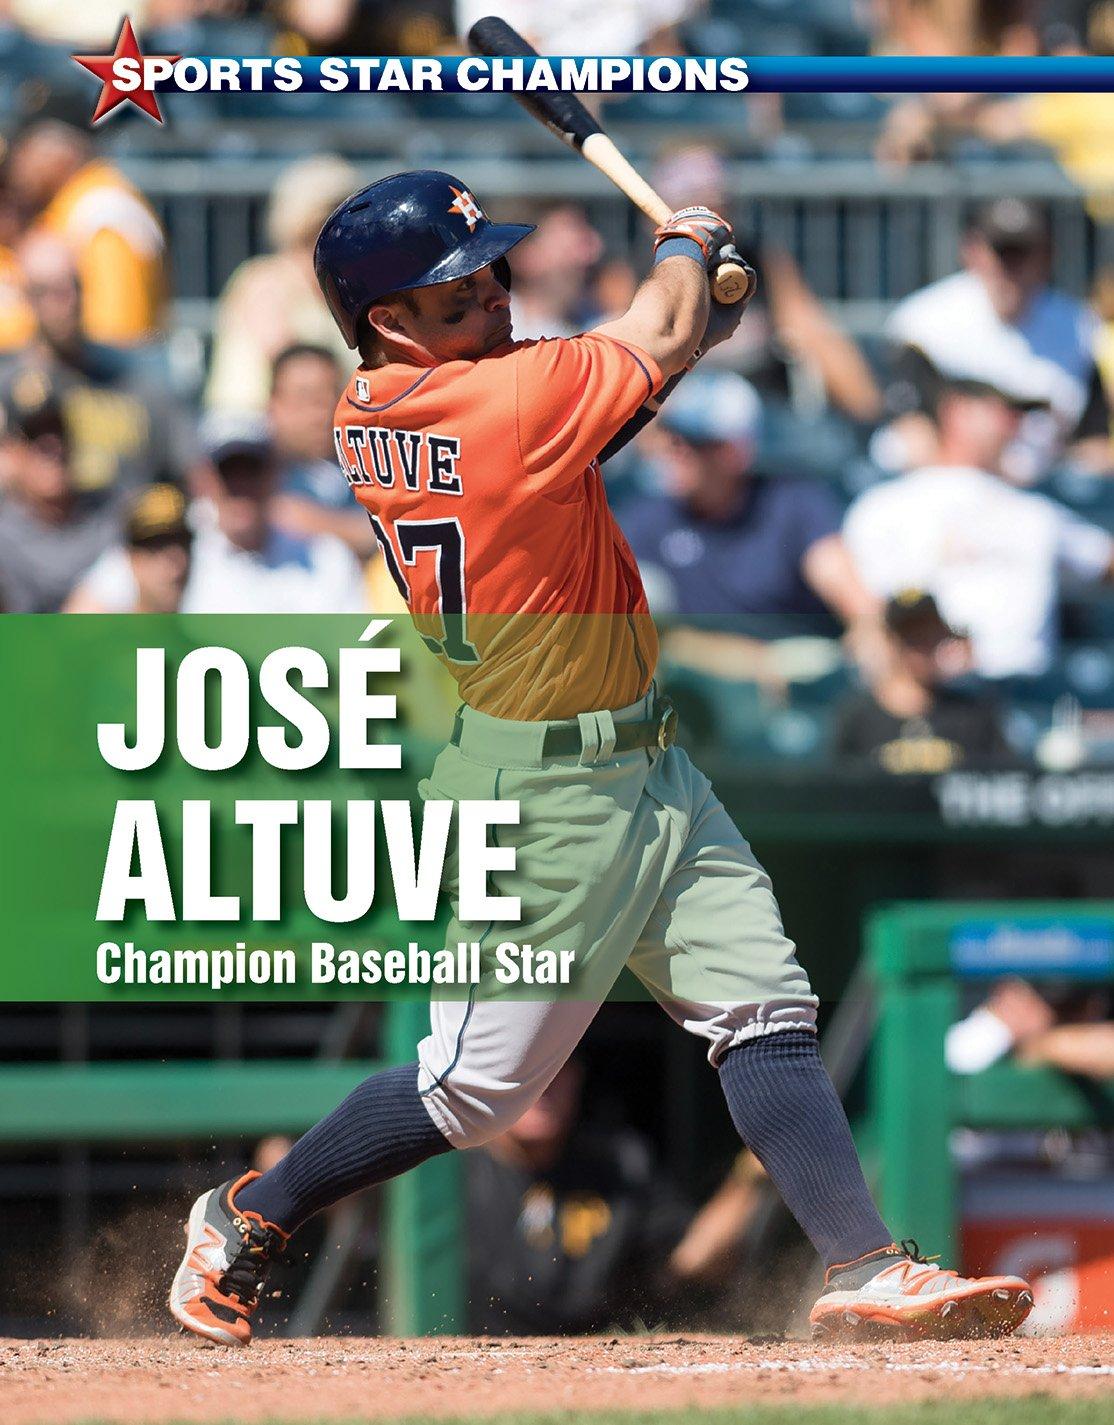 Jose Altuve: Champion Baseball Star (Sports Star Champions)